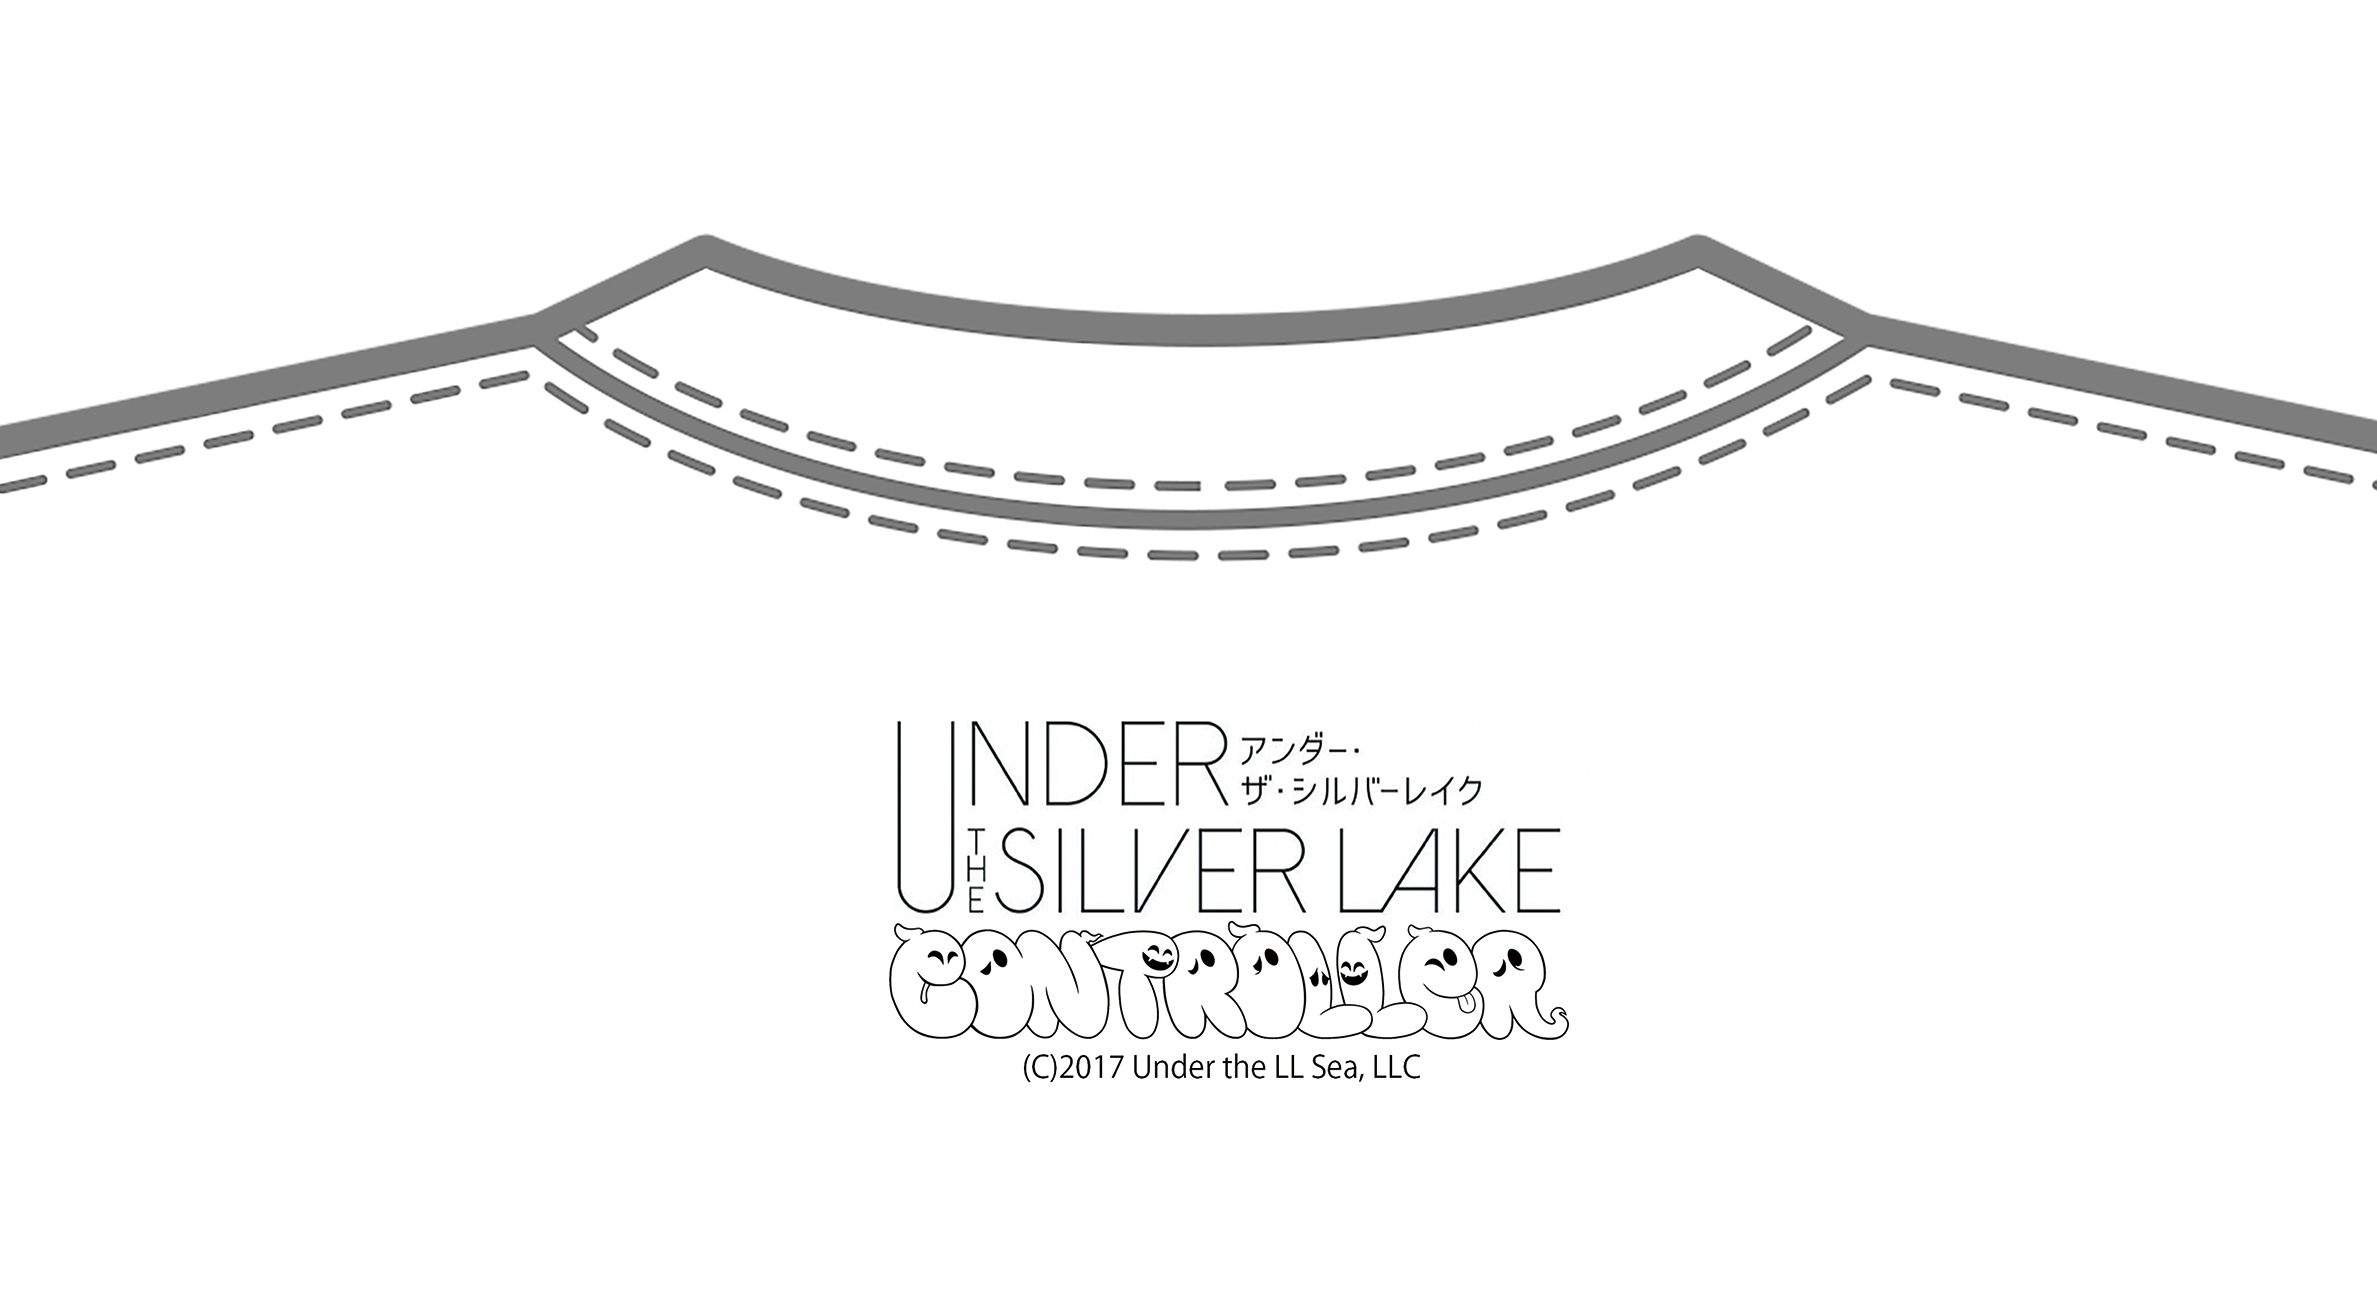 UNDER THE SILVER LAKE / CONTROLLER  コラボTシャツ タイトル写真バージョン